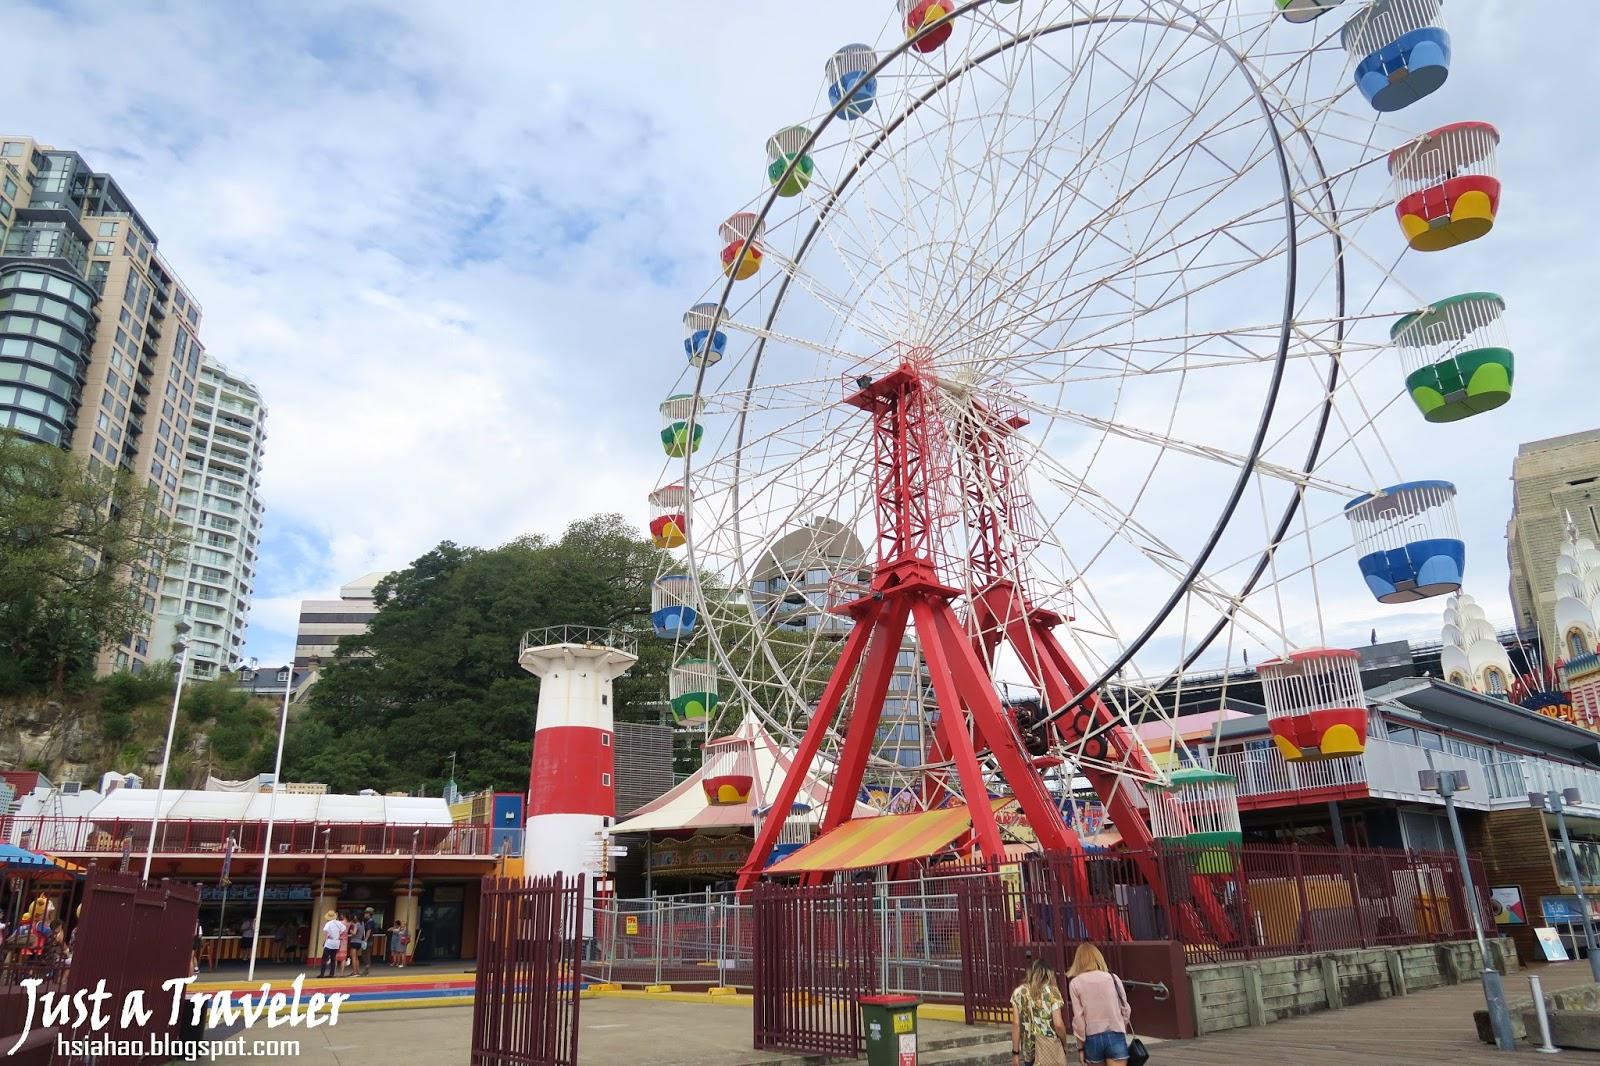 雪梨-景點-推薦-遊樂園-雪梨月神公園-Luna-Park-旅遊-自由行-澳洲-Sydney-Tourist-Attraction-Travel-Australia